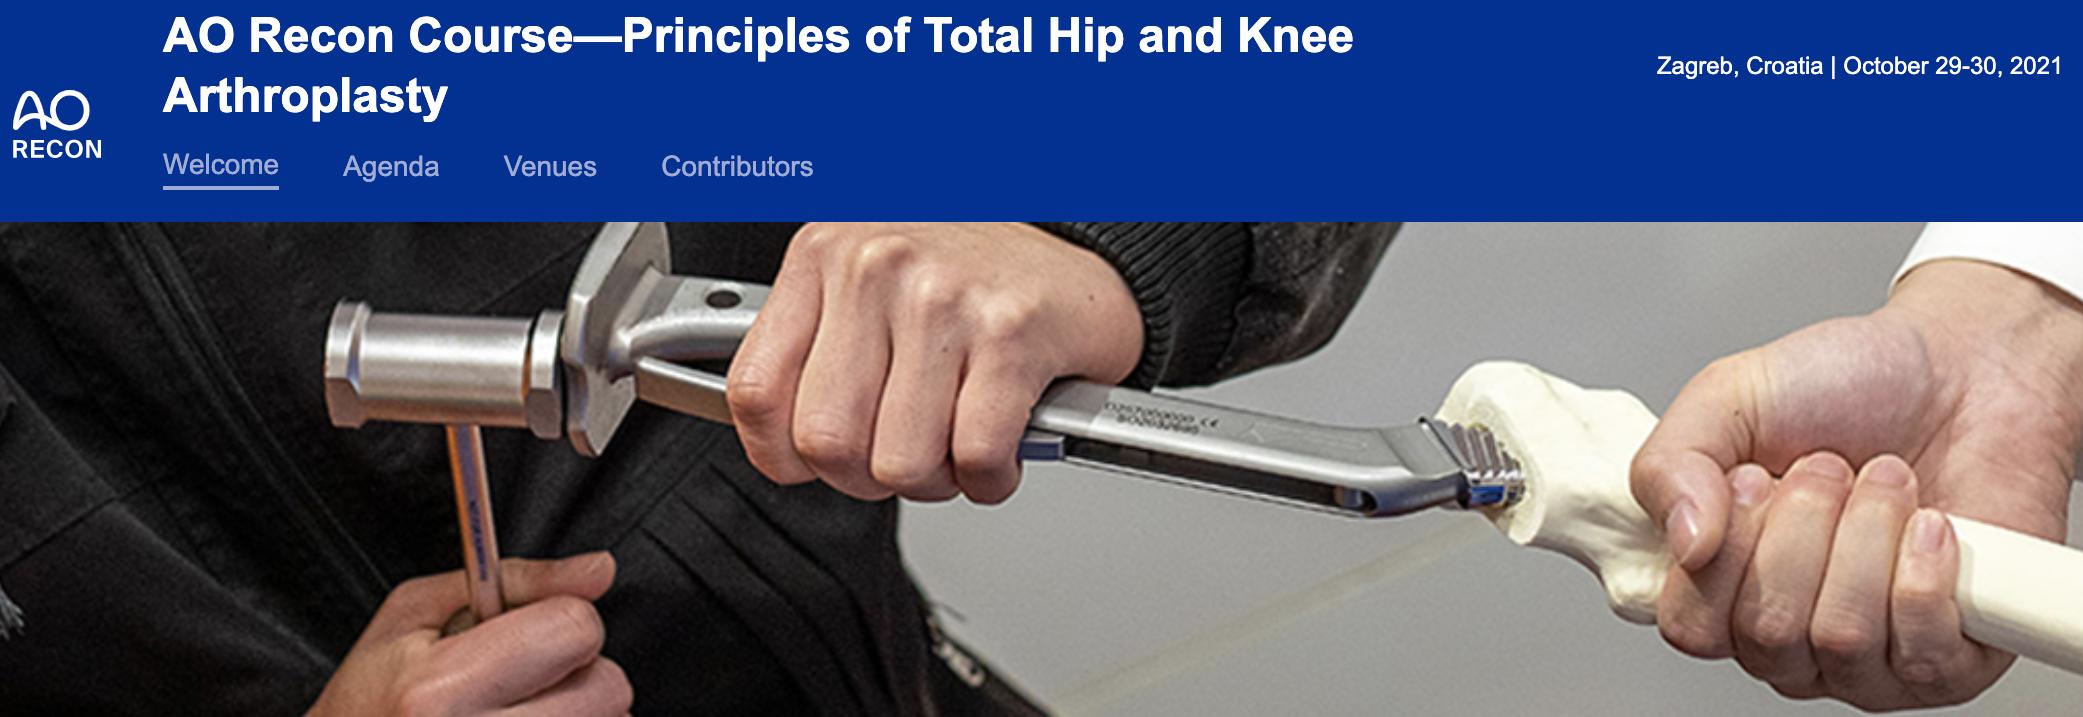 "NAJAVA: ""AO Recon Course —Principles of Total Hip and Knee Arthroplasty"" 29.-30.10.2021. Zagreb"